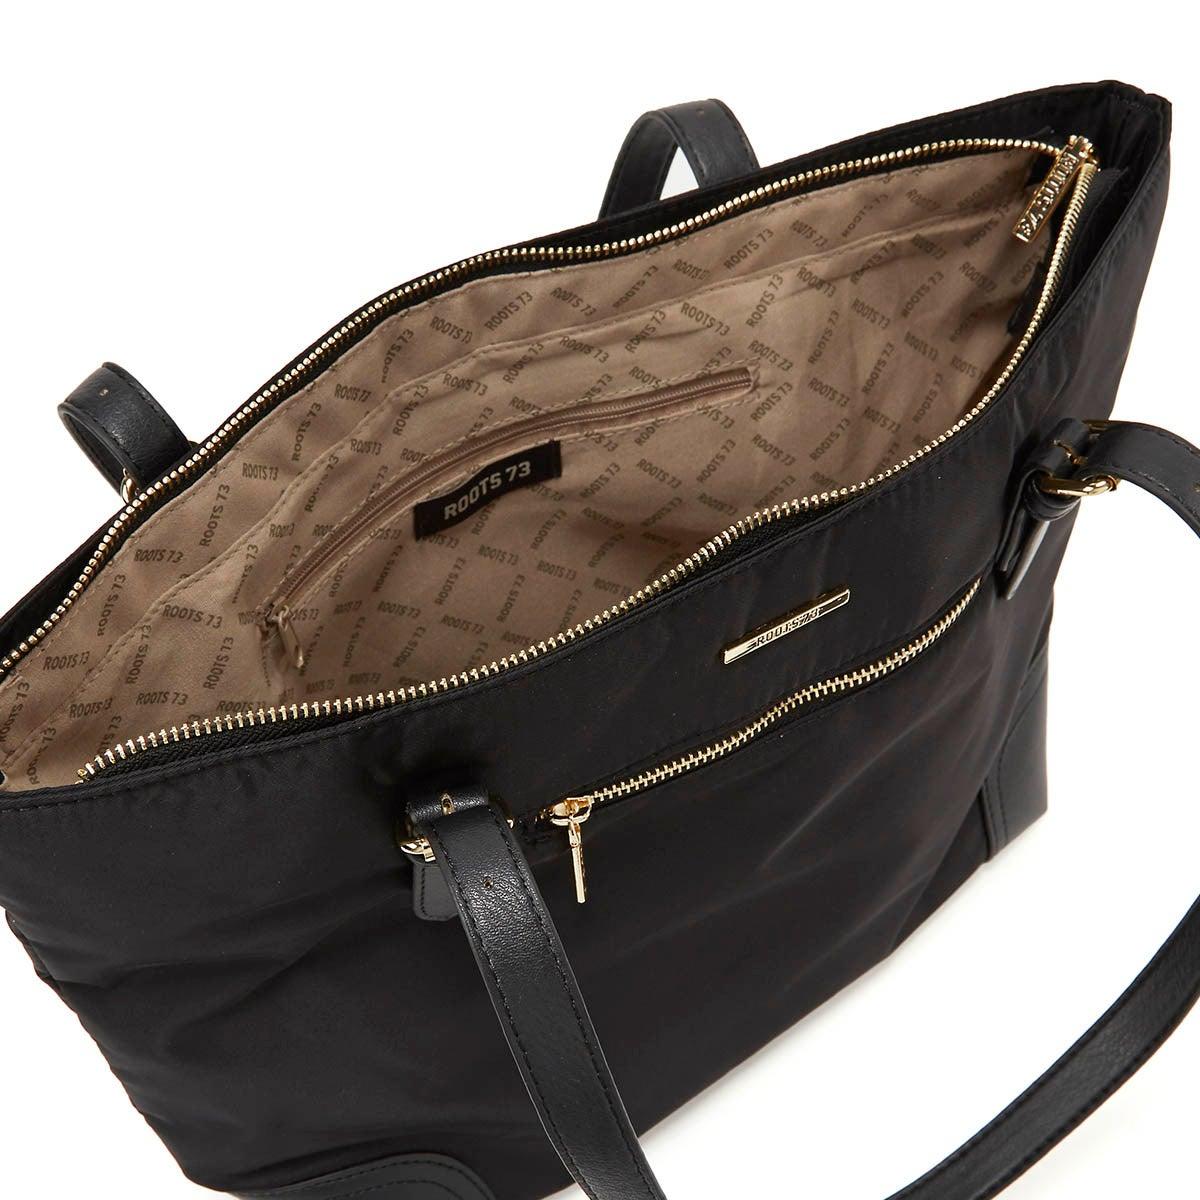 Lds black/black large satchel